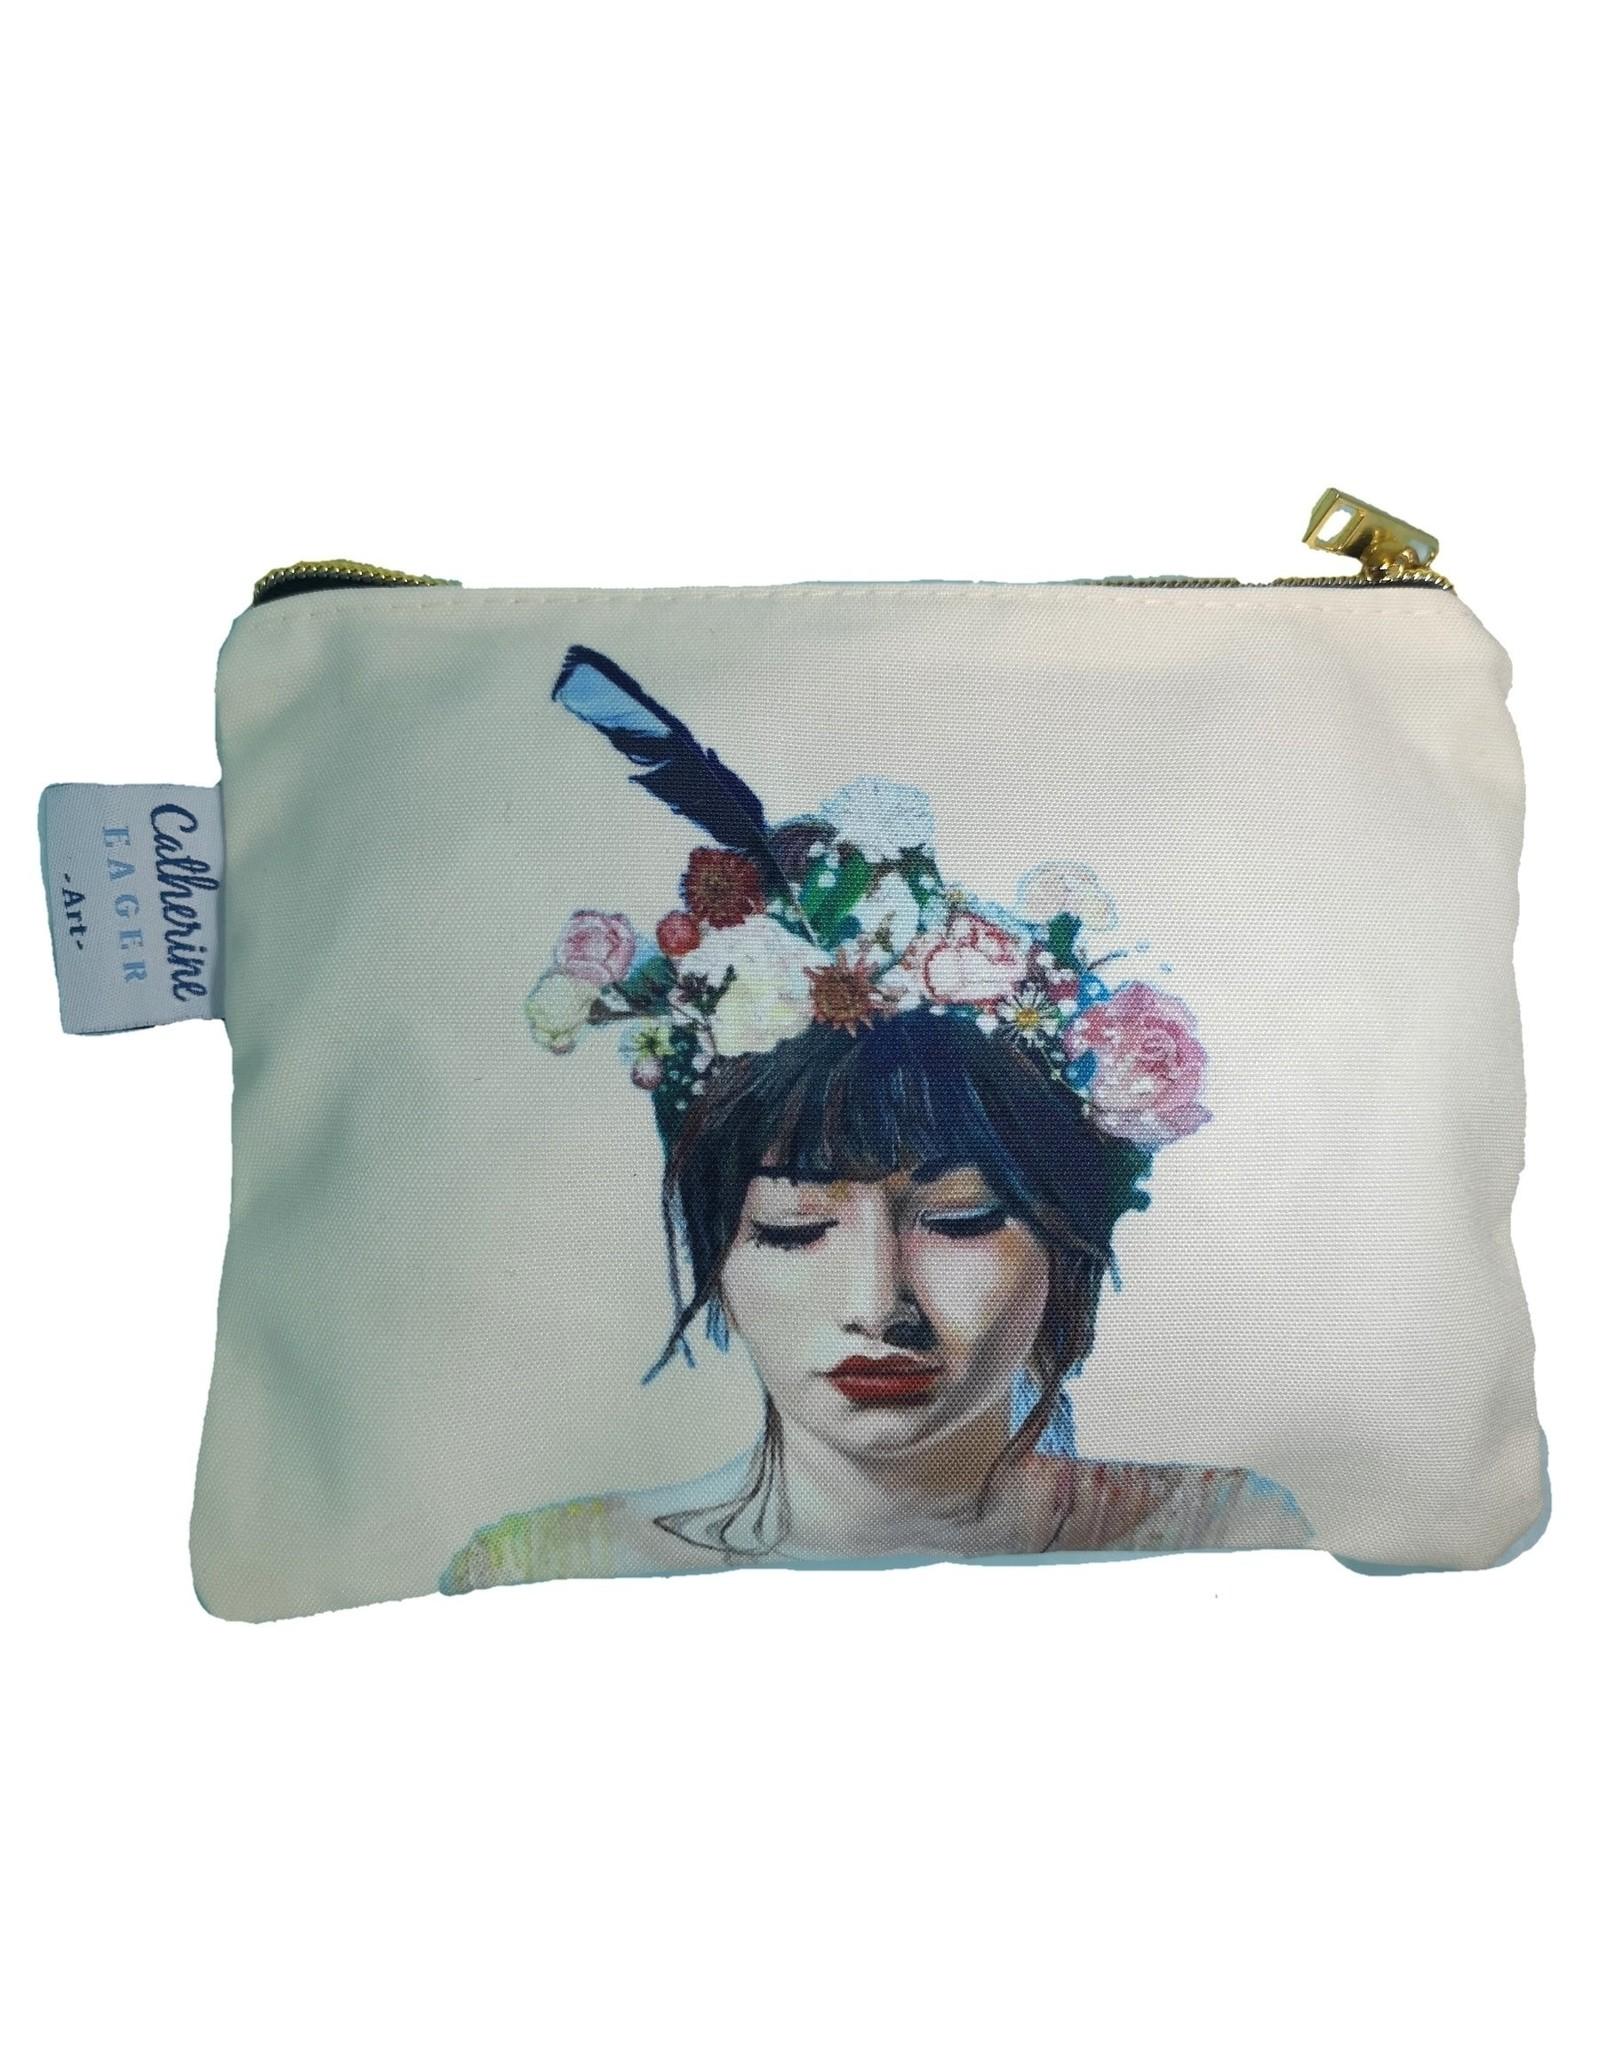 Catherine Eager Art The Goddesss Bag - Athena